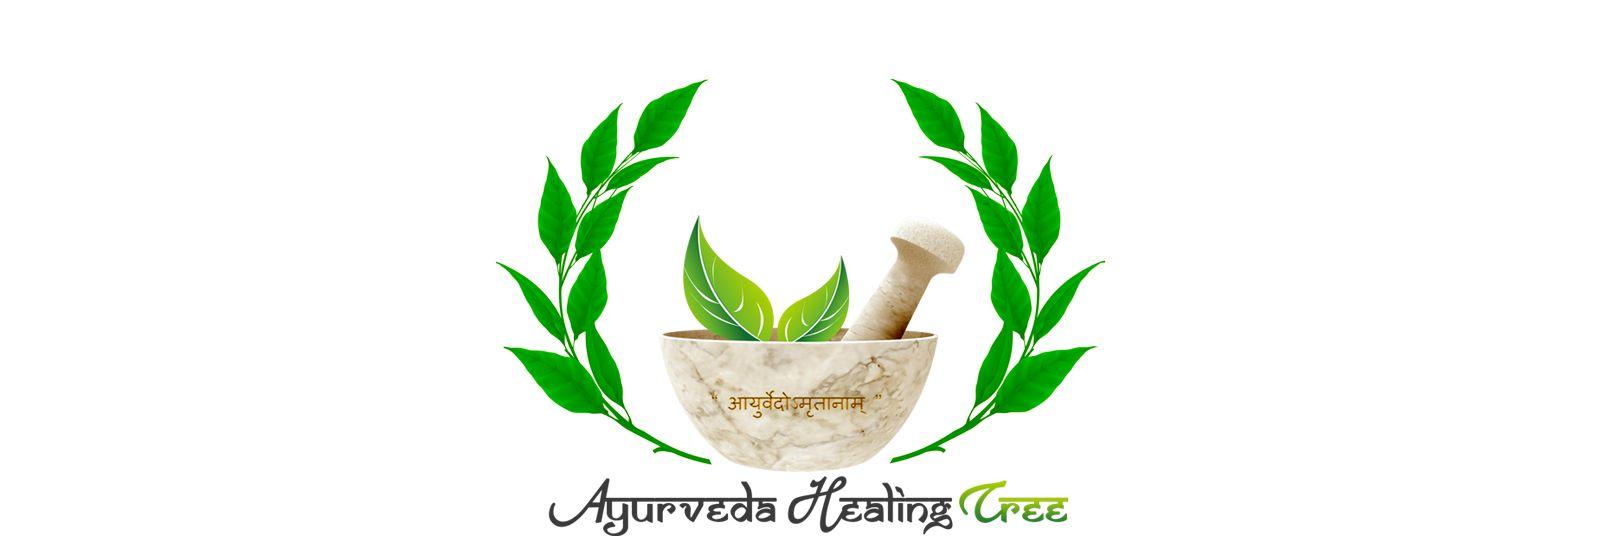 best-ayurveda-in-kovalam-banner1